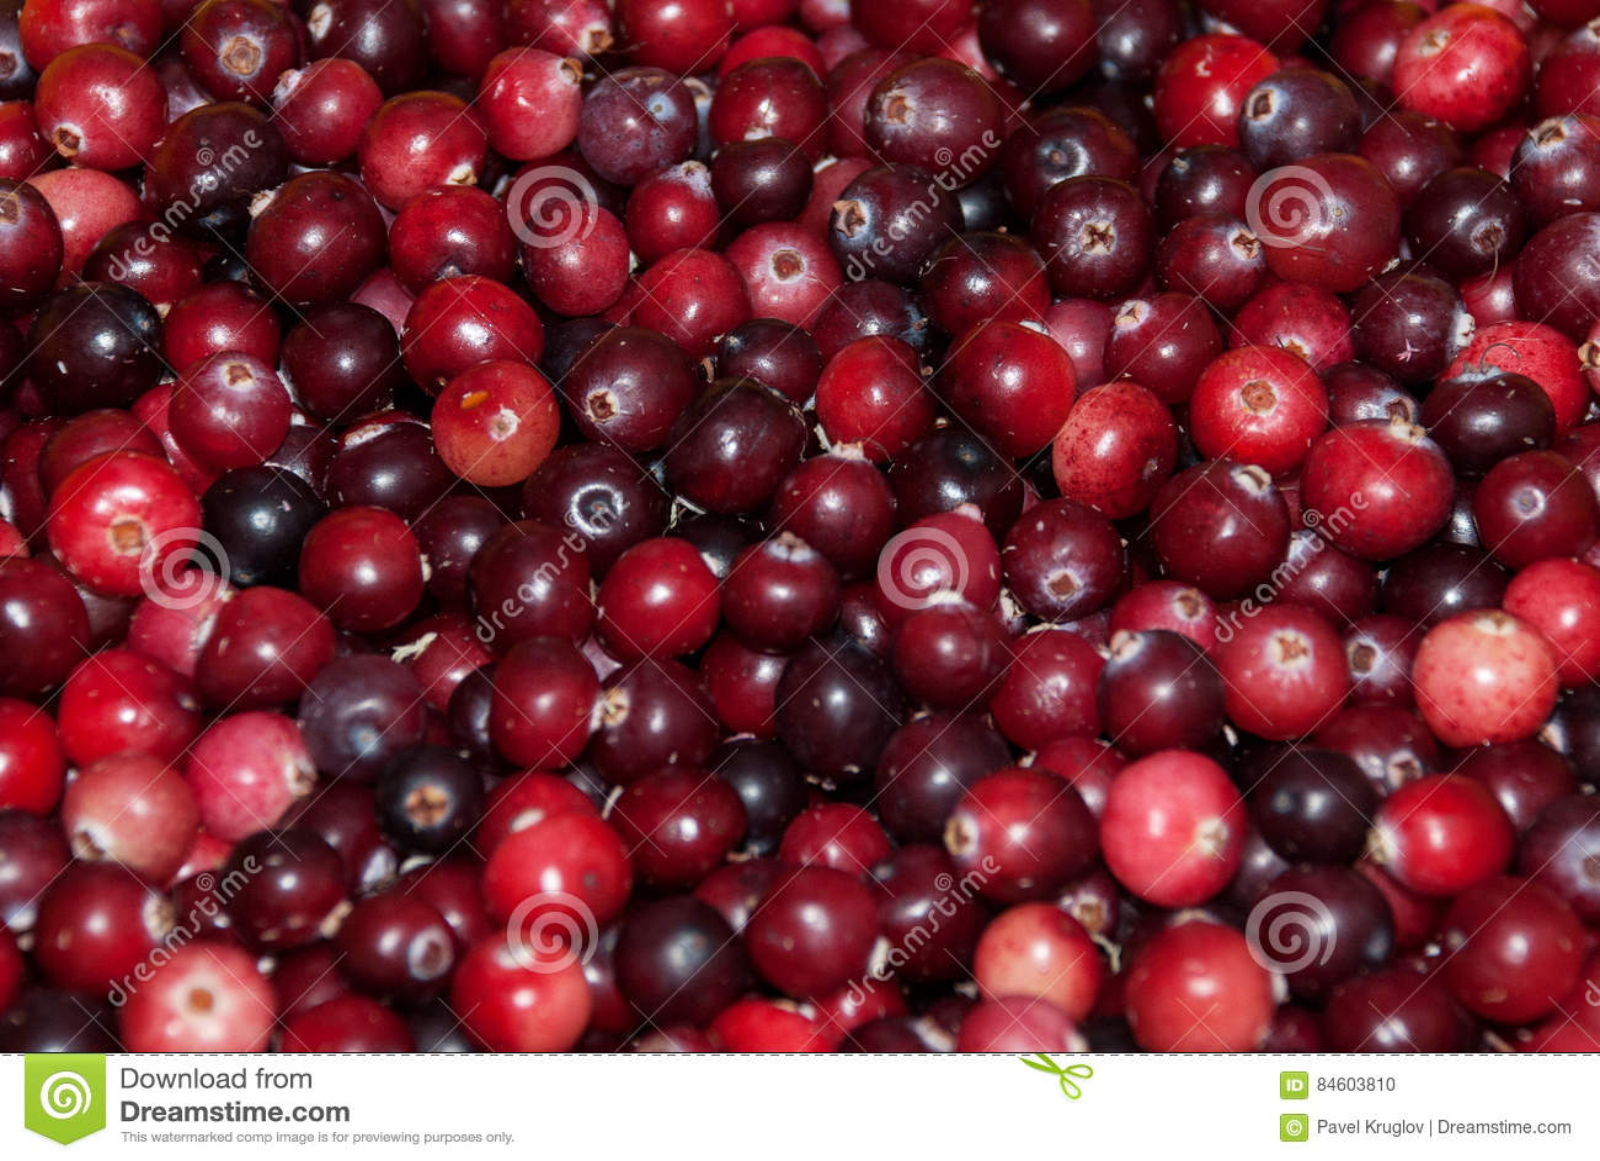 Fresh cranberry wallpaper